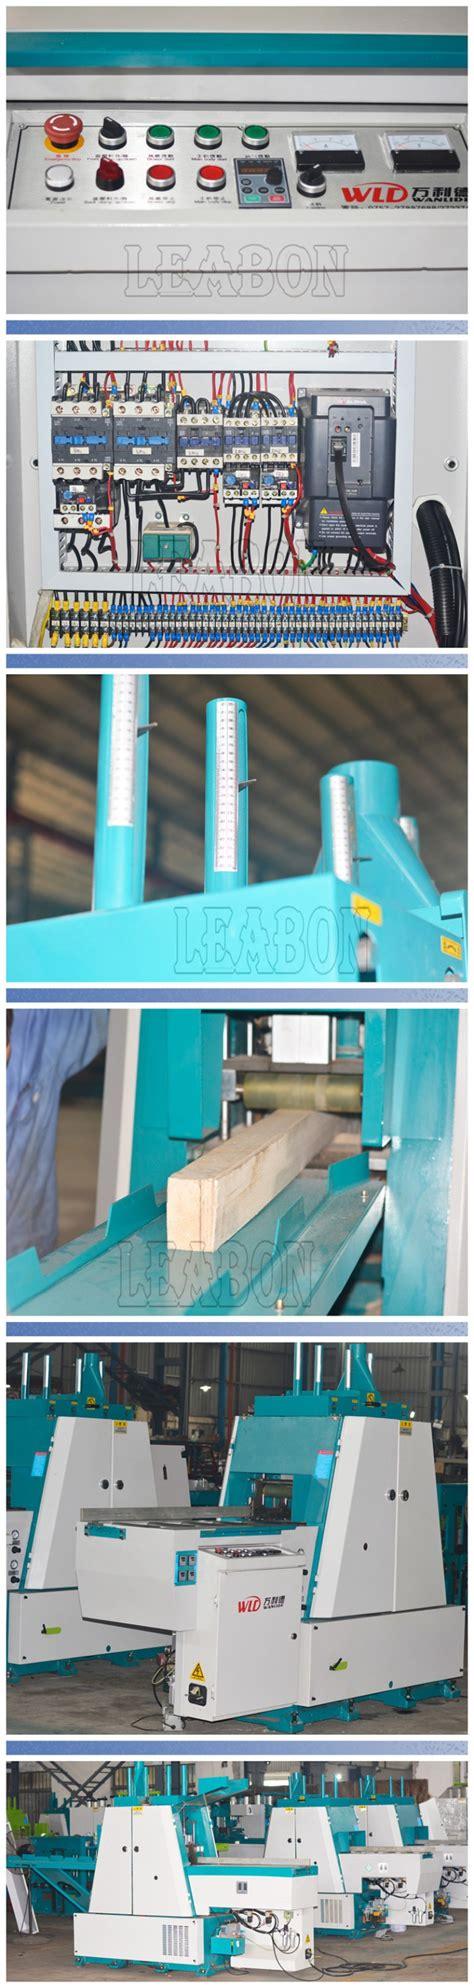 Sm 25 20 Thin Cutting Frame Saw Machine Good For Wood